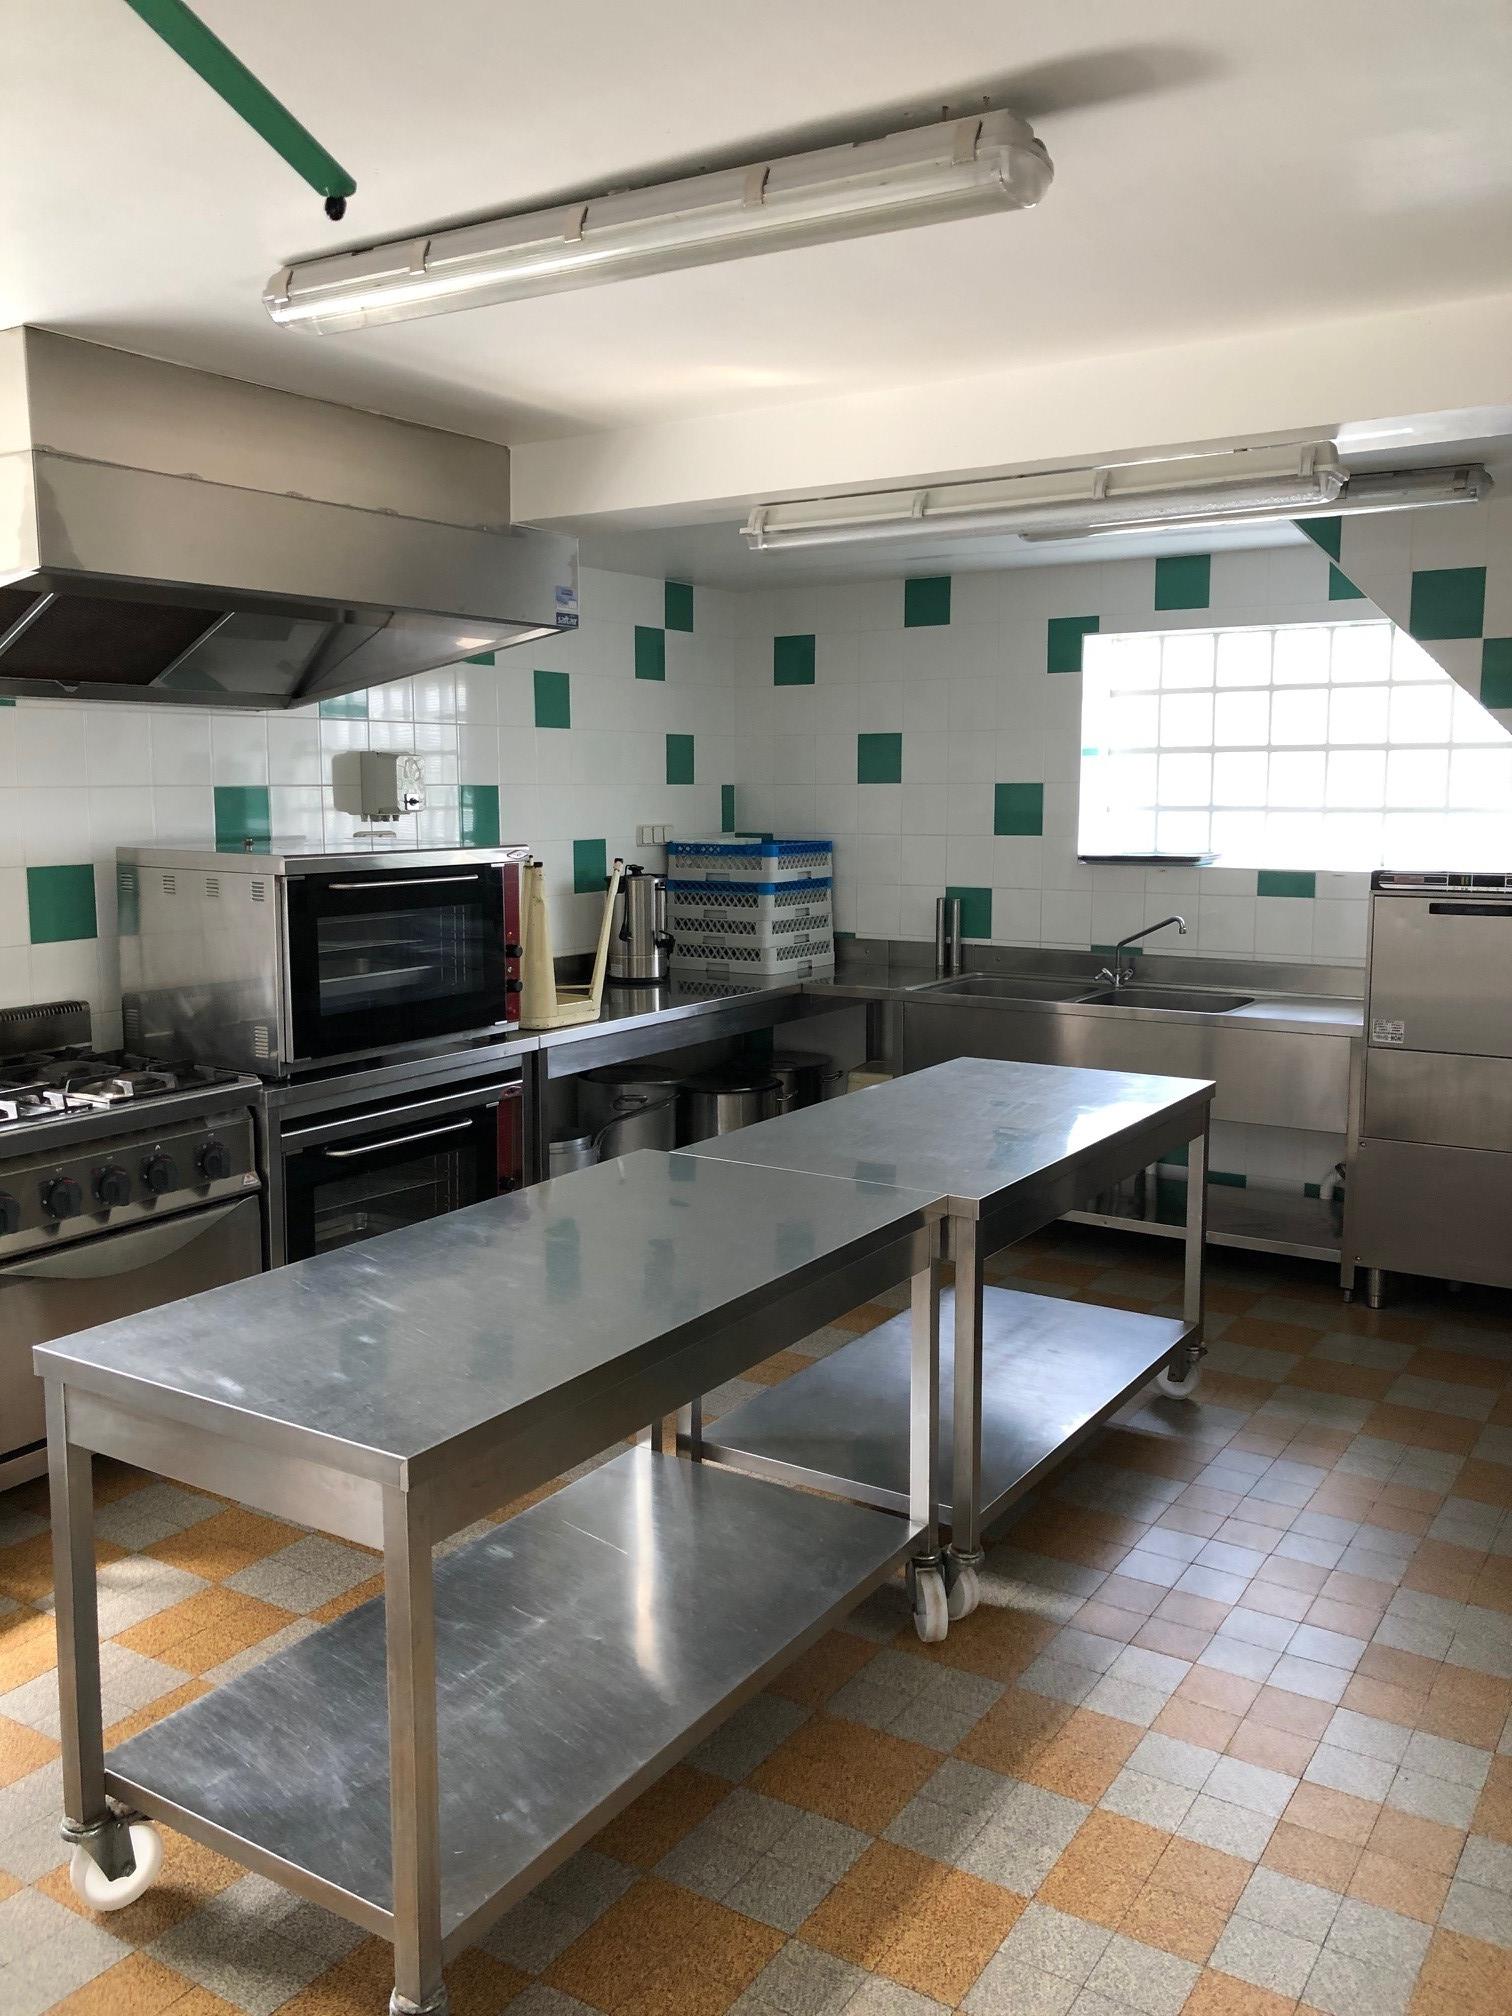 Les cuisines 1